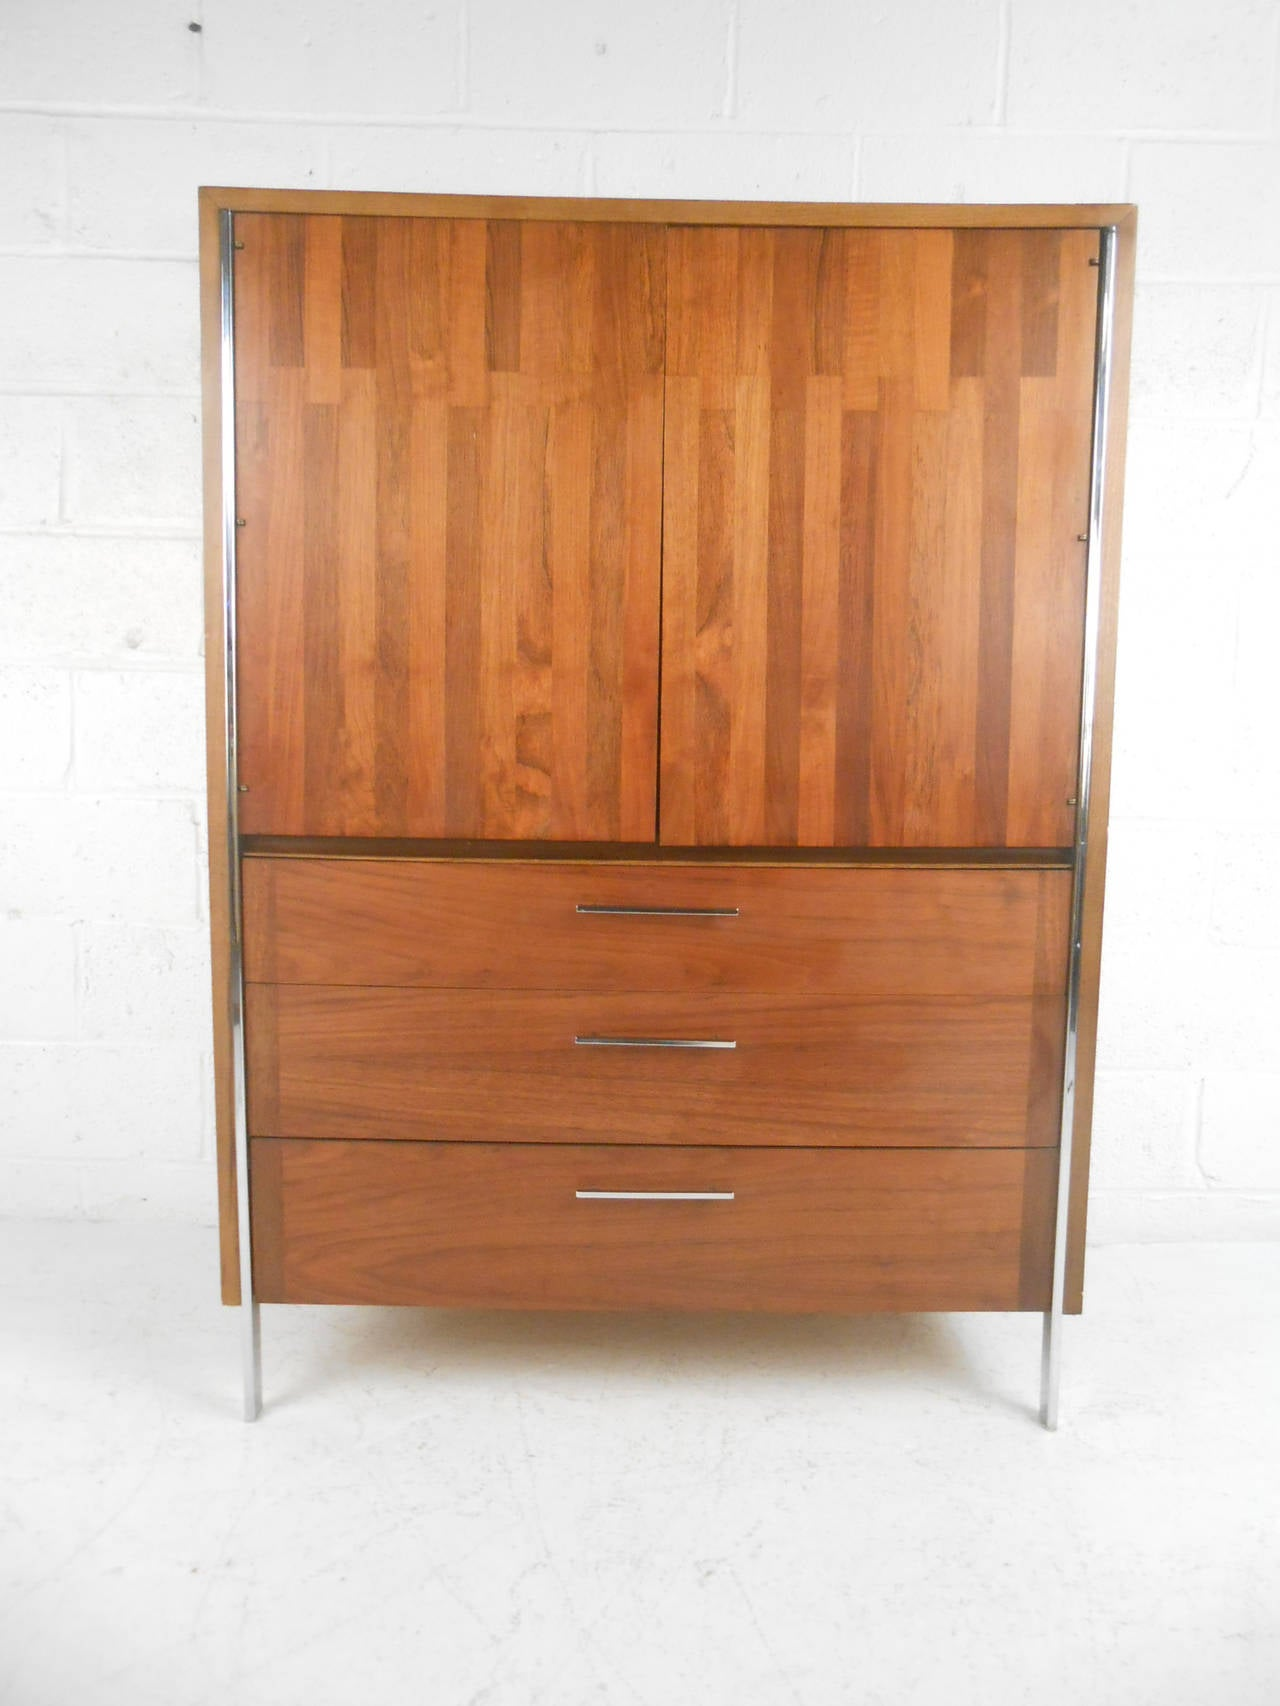 Exquisite Mid Century Modern Gentleman 39 S Chest By Lane Furniture At 1stdibs